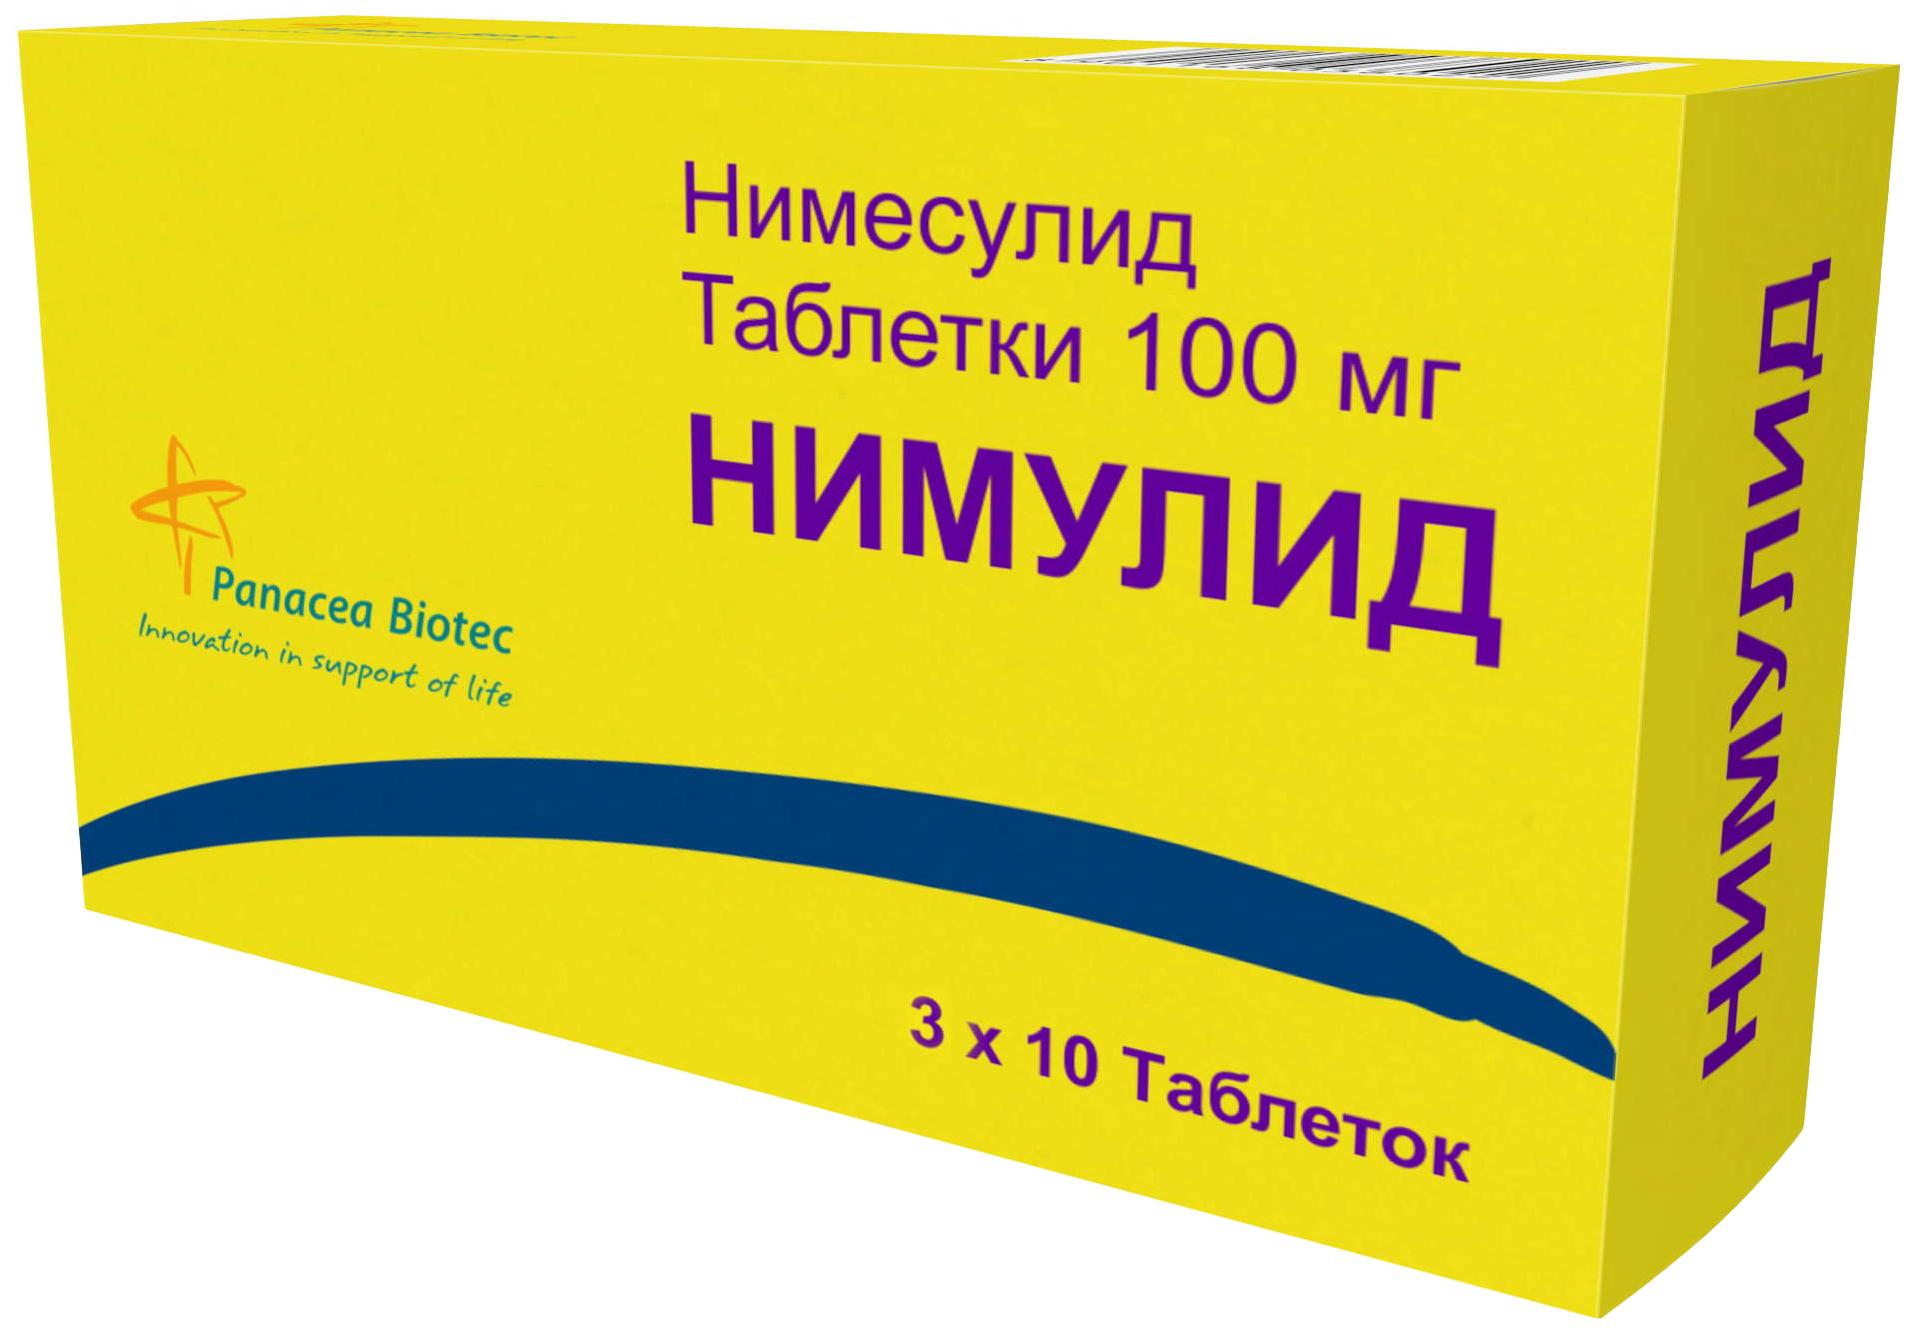 Нимулид таблетки 100 мг 30 шт.